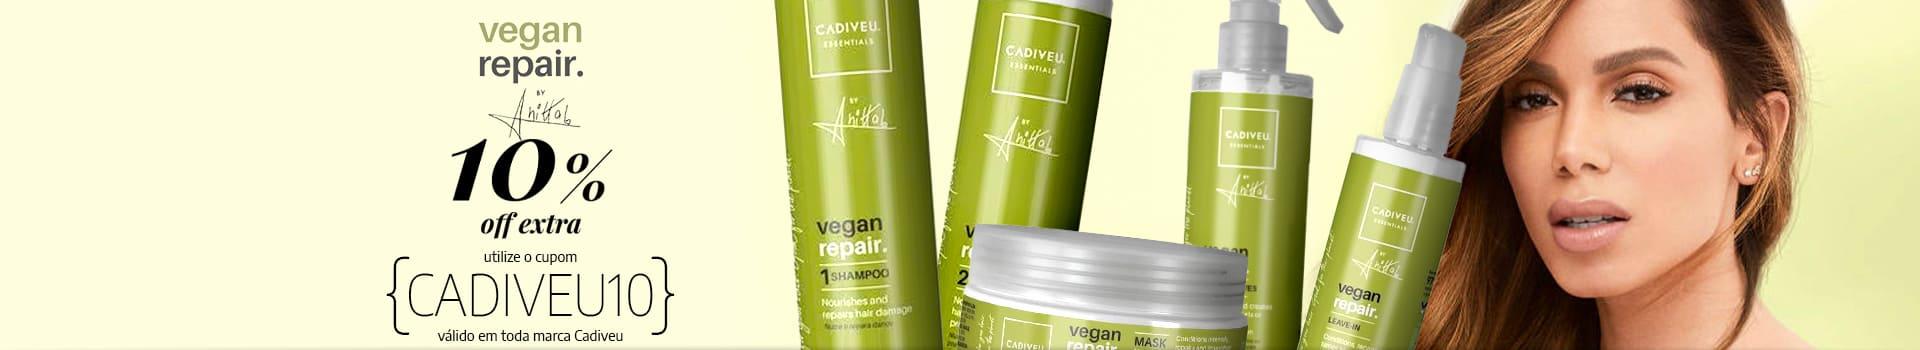 Cadiveu Vegan Repair da Anitta com 10% OFF EXTRA